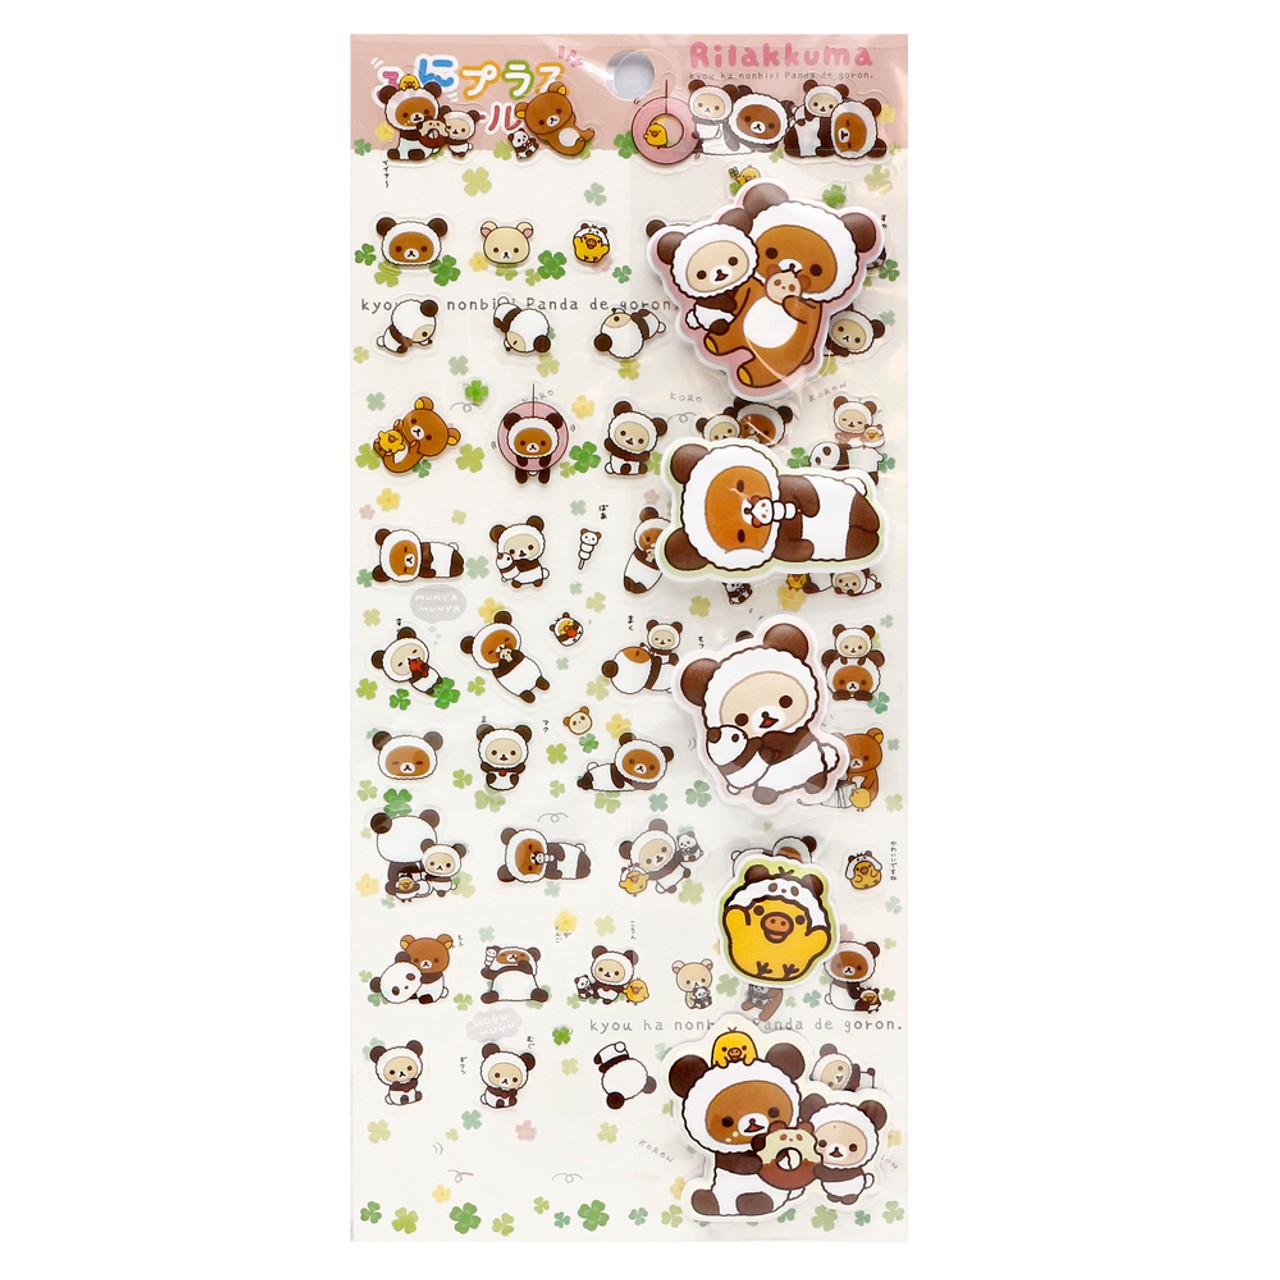 San-x Rilakkuma Relax Bear Panda Costume With Clover Sticker SE27702 ( Front View )